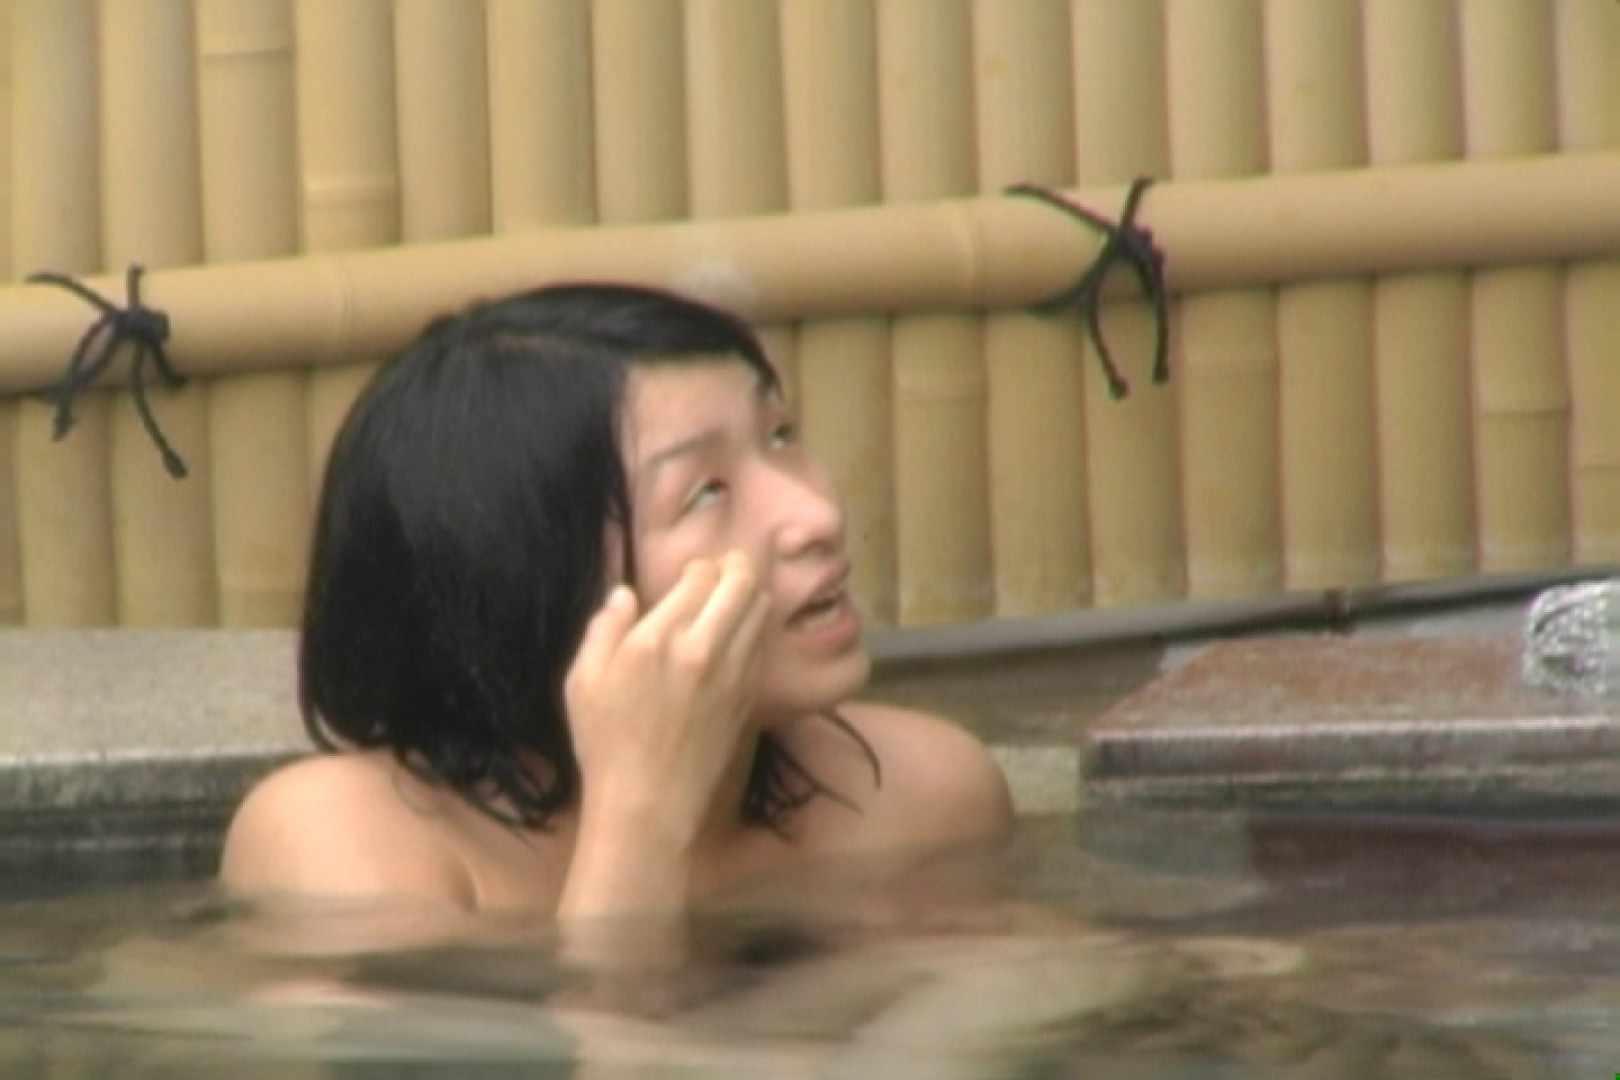 Aquaな露天風呂Vol.618 露天風呂 エロ画像 67連発 41